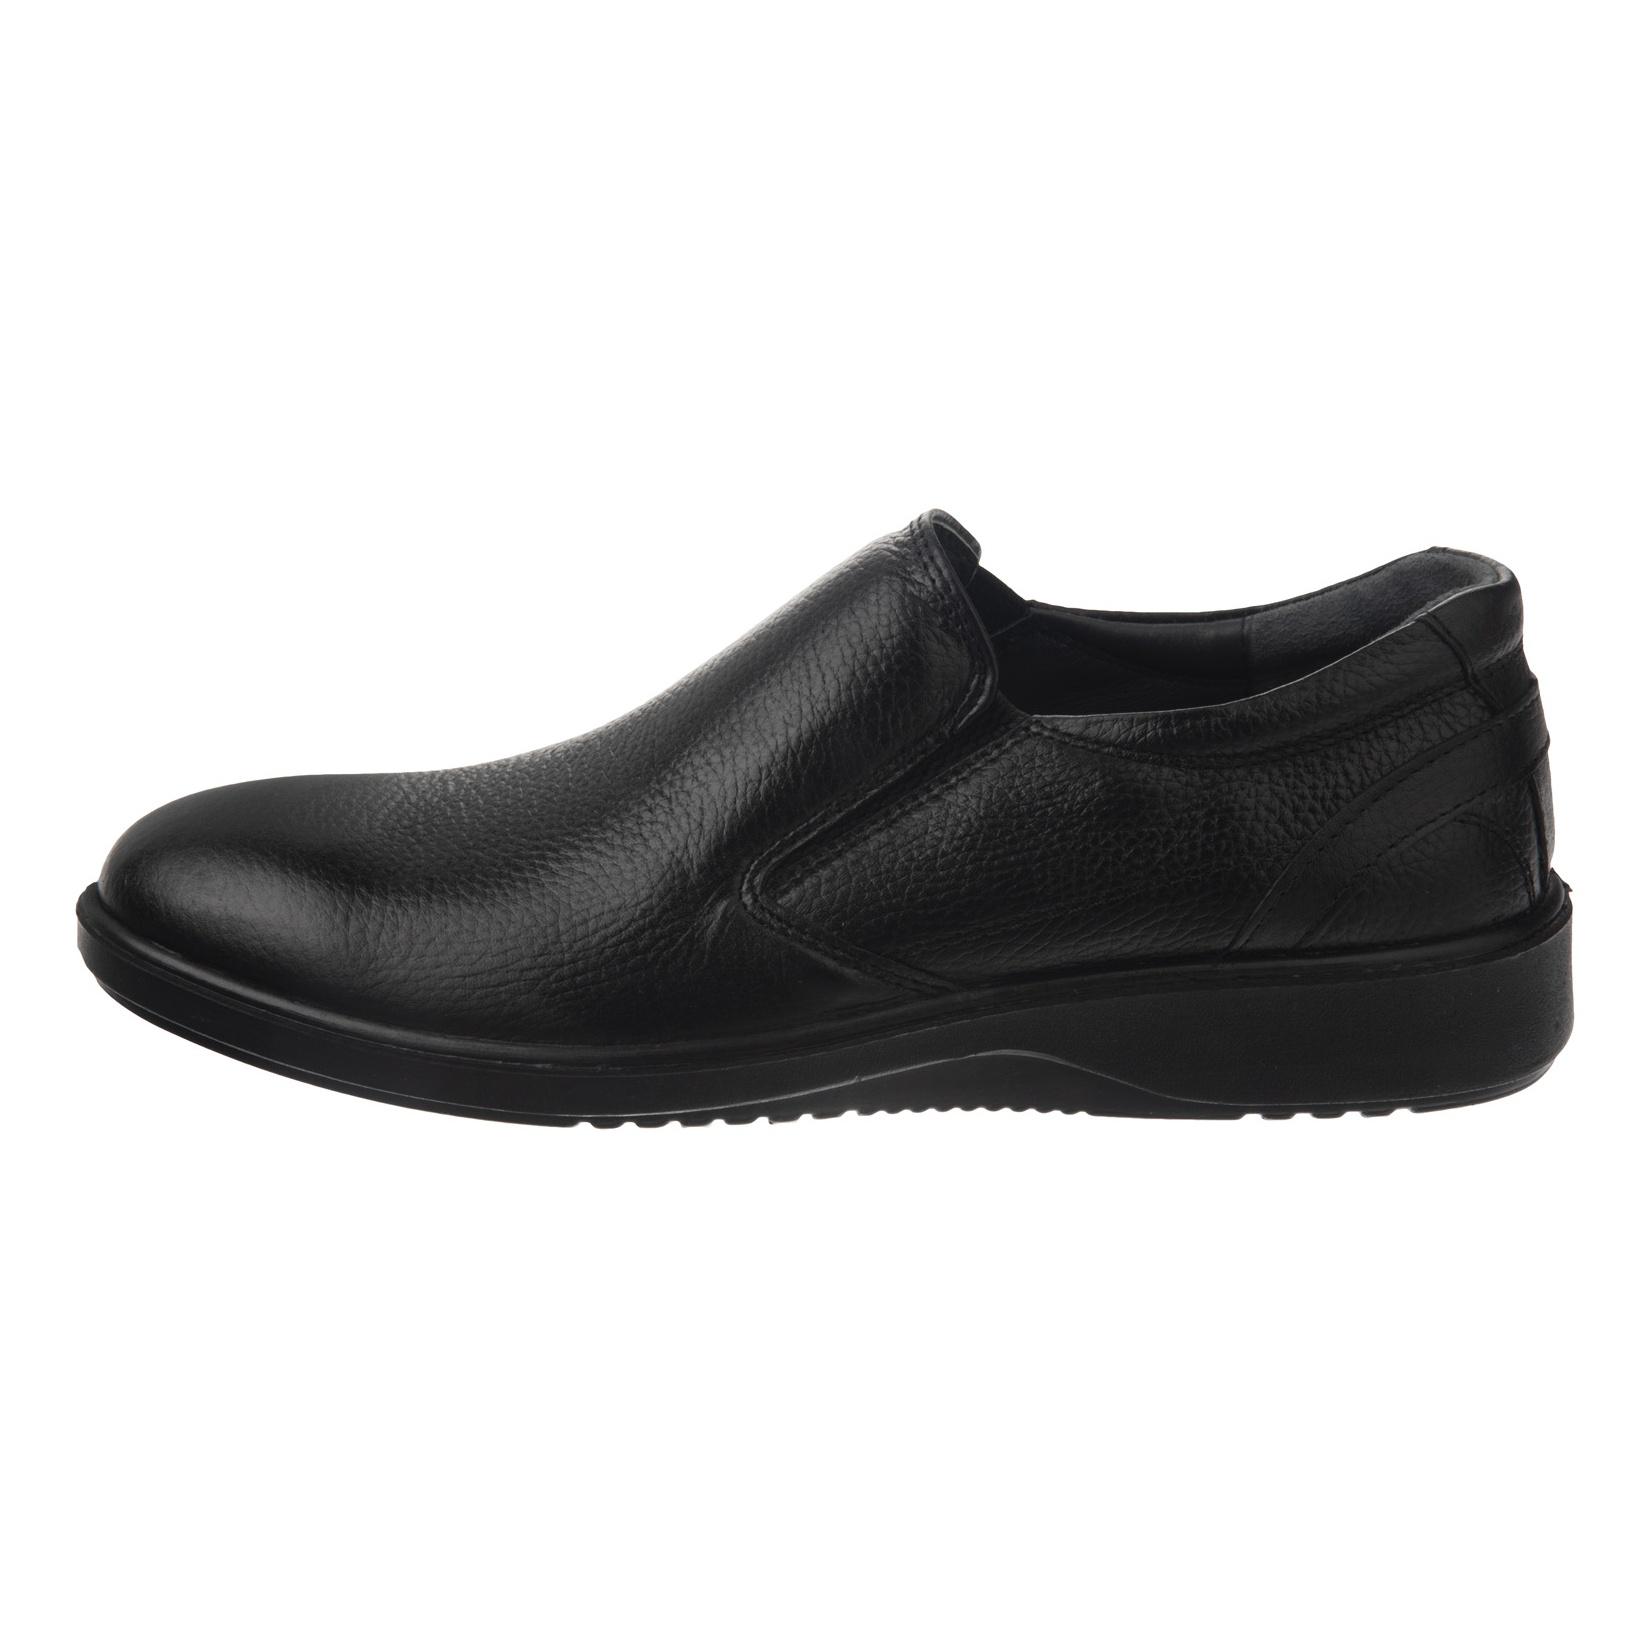 کفش روزمره مردانه شیفر مدل 7216A-101 - مشکی - 3